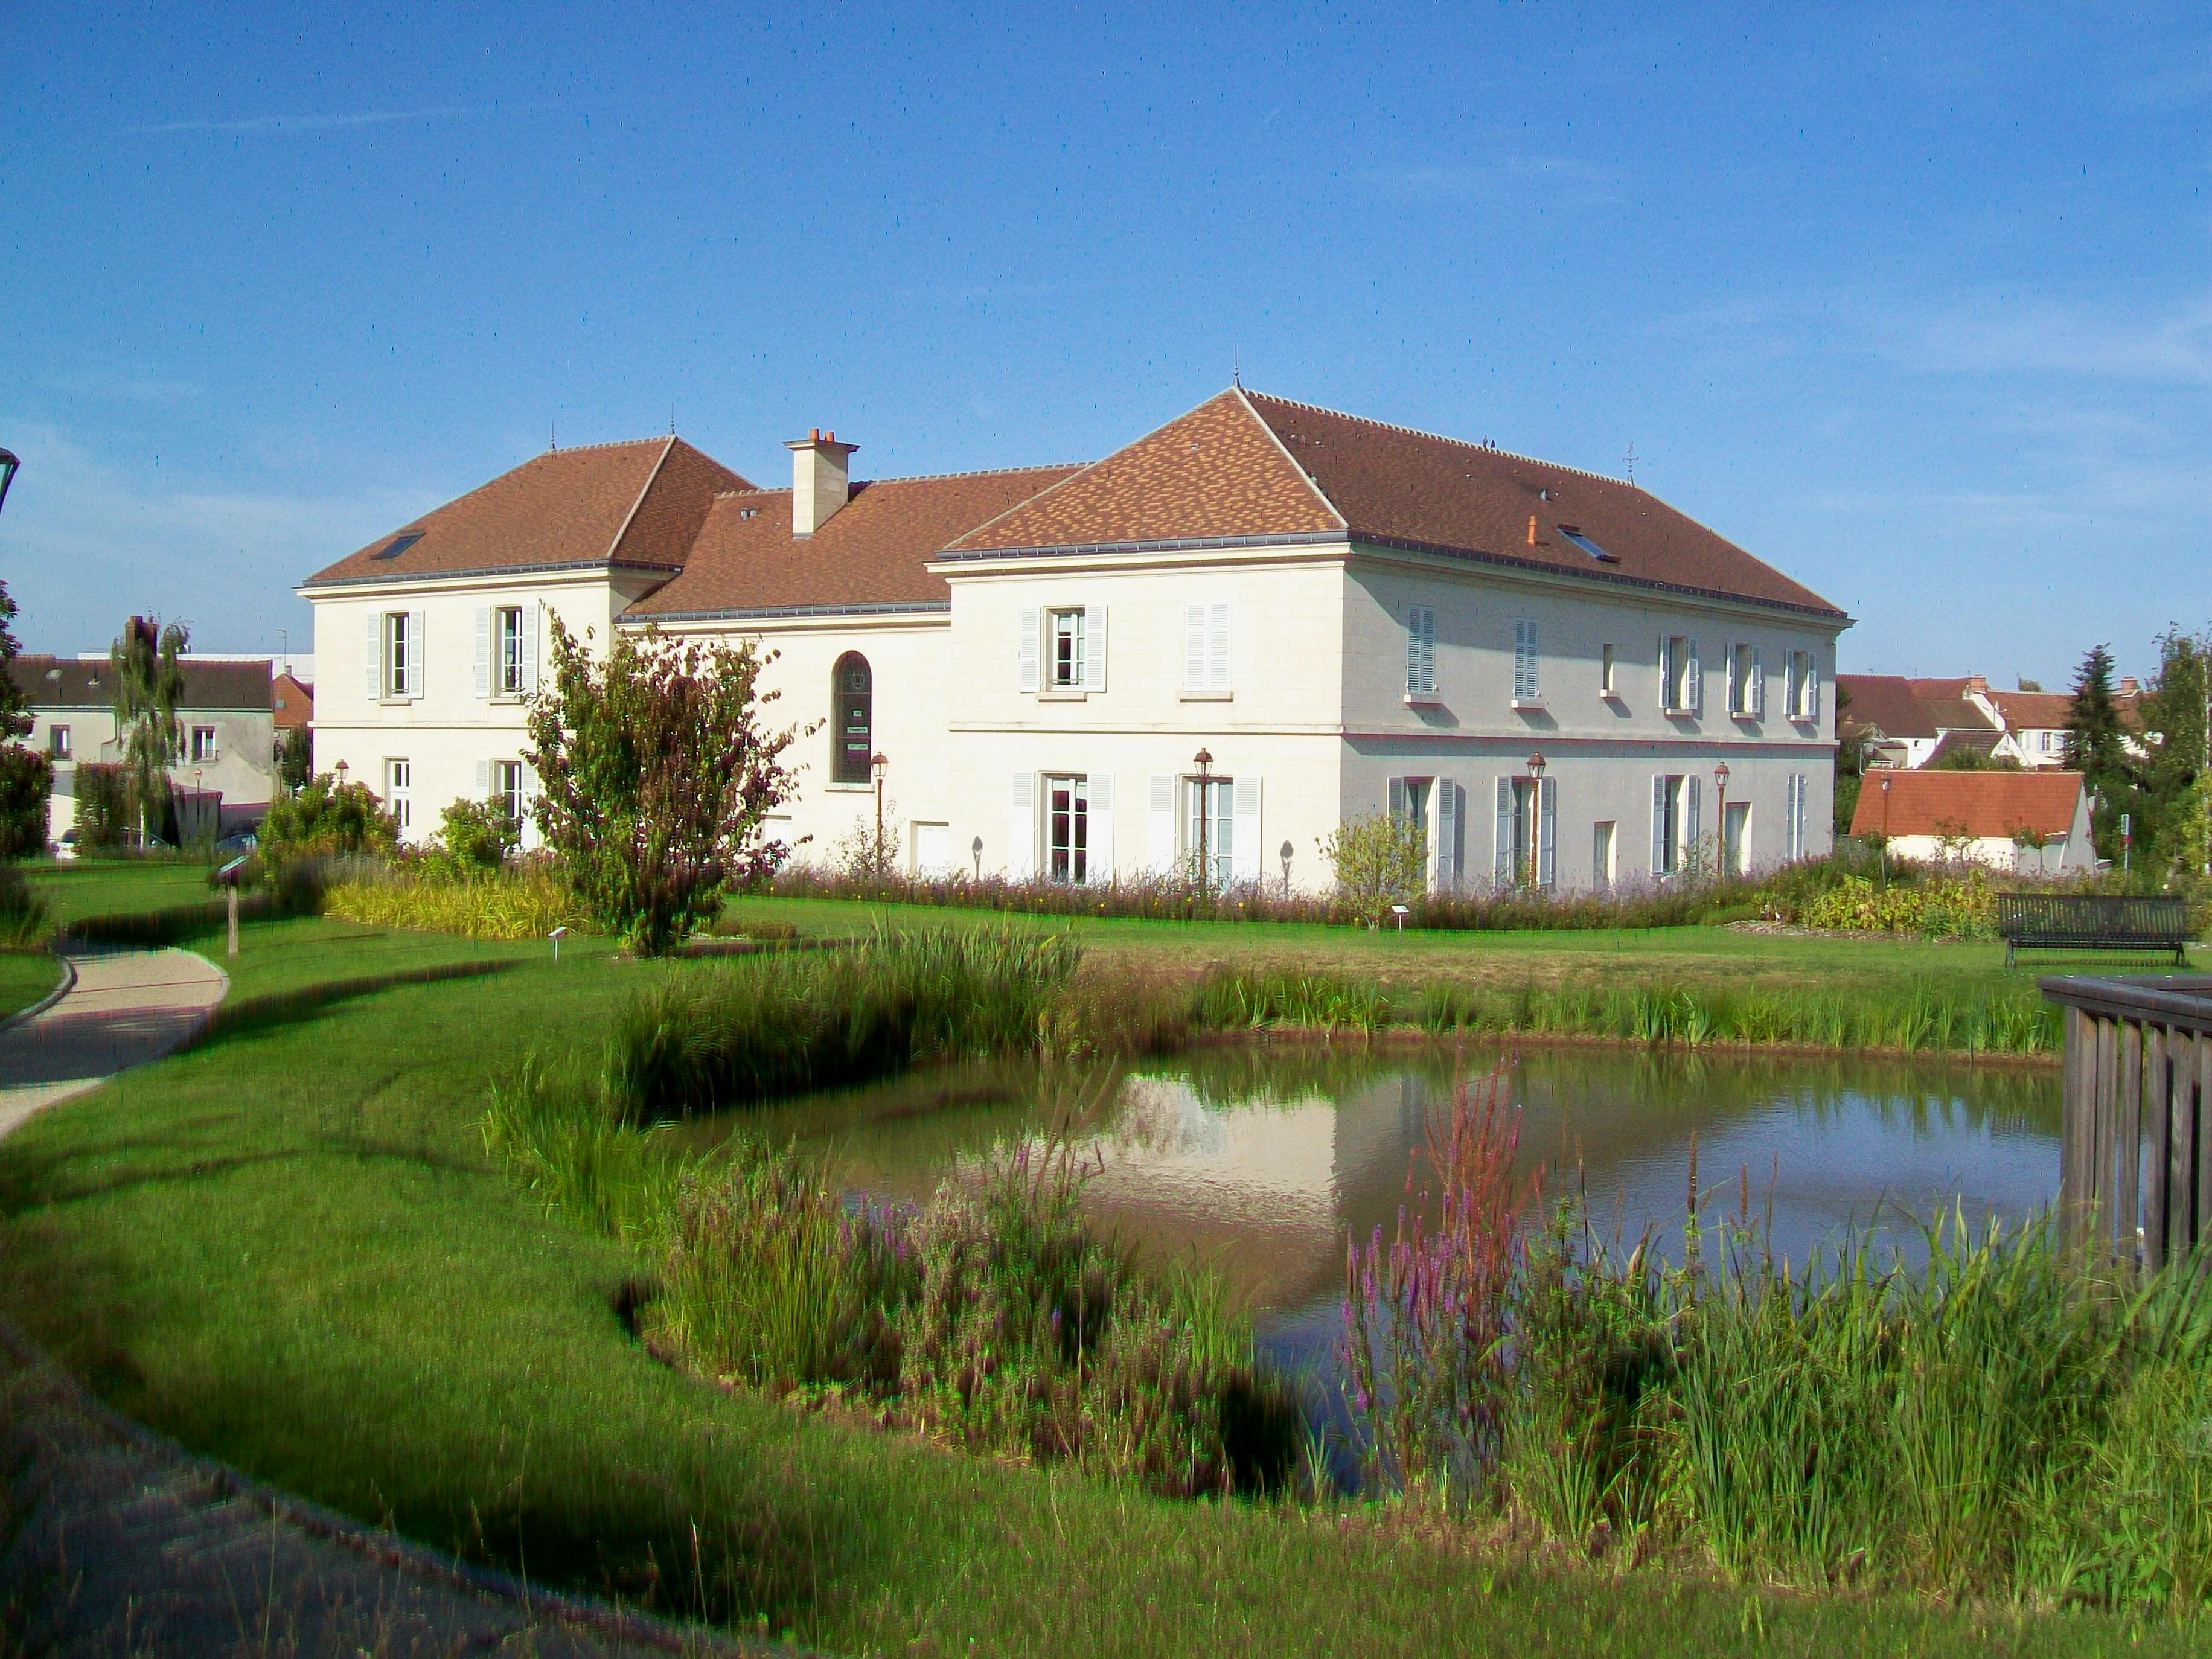 Le Mesnil-Amelot